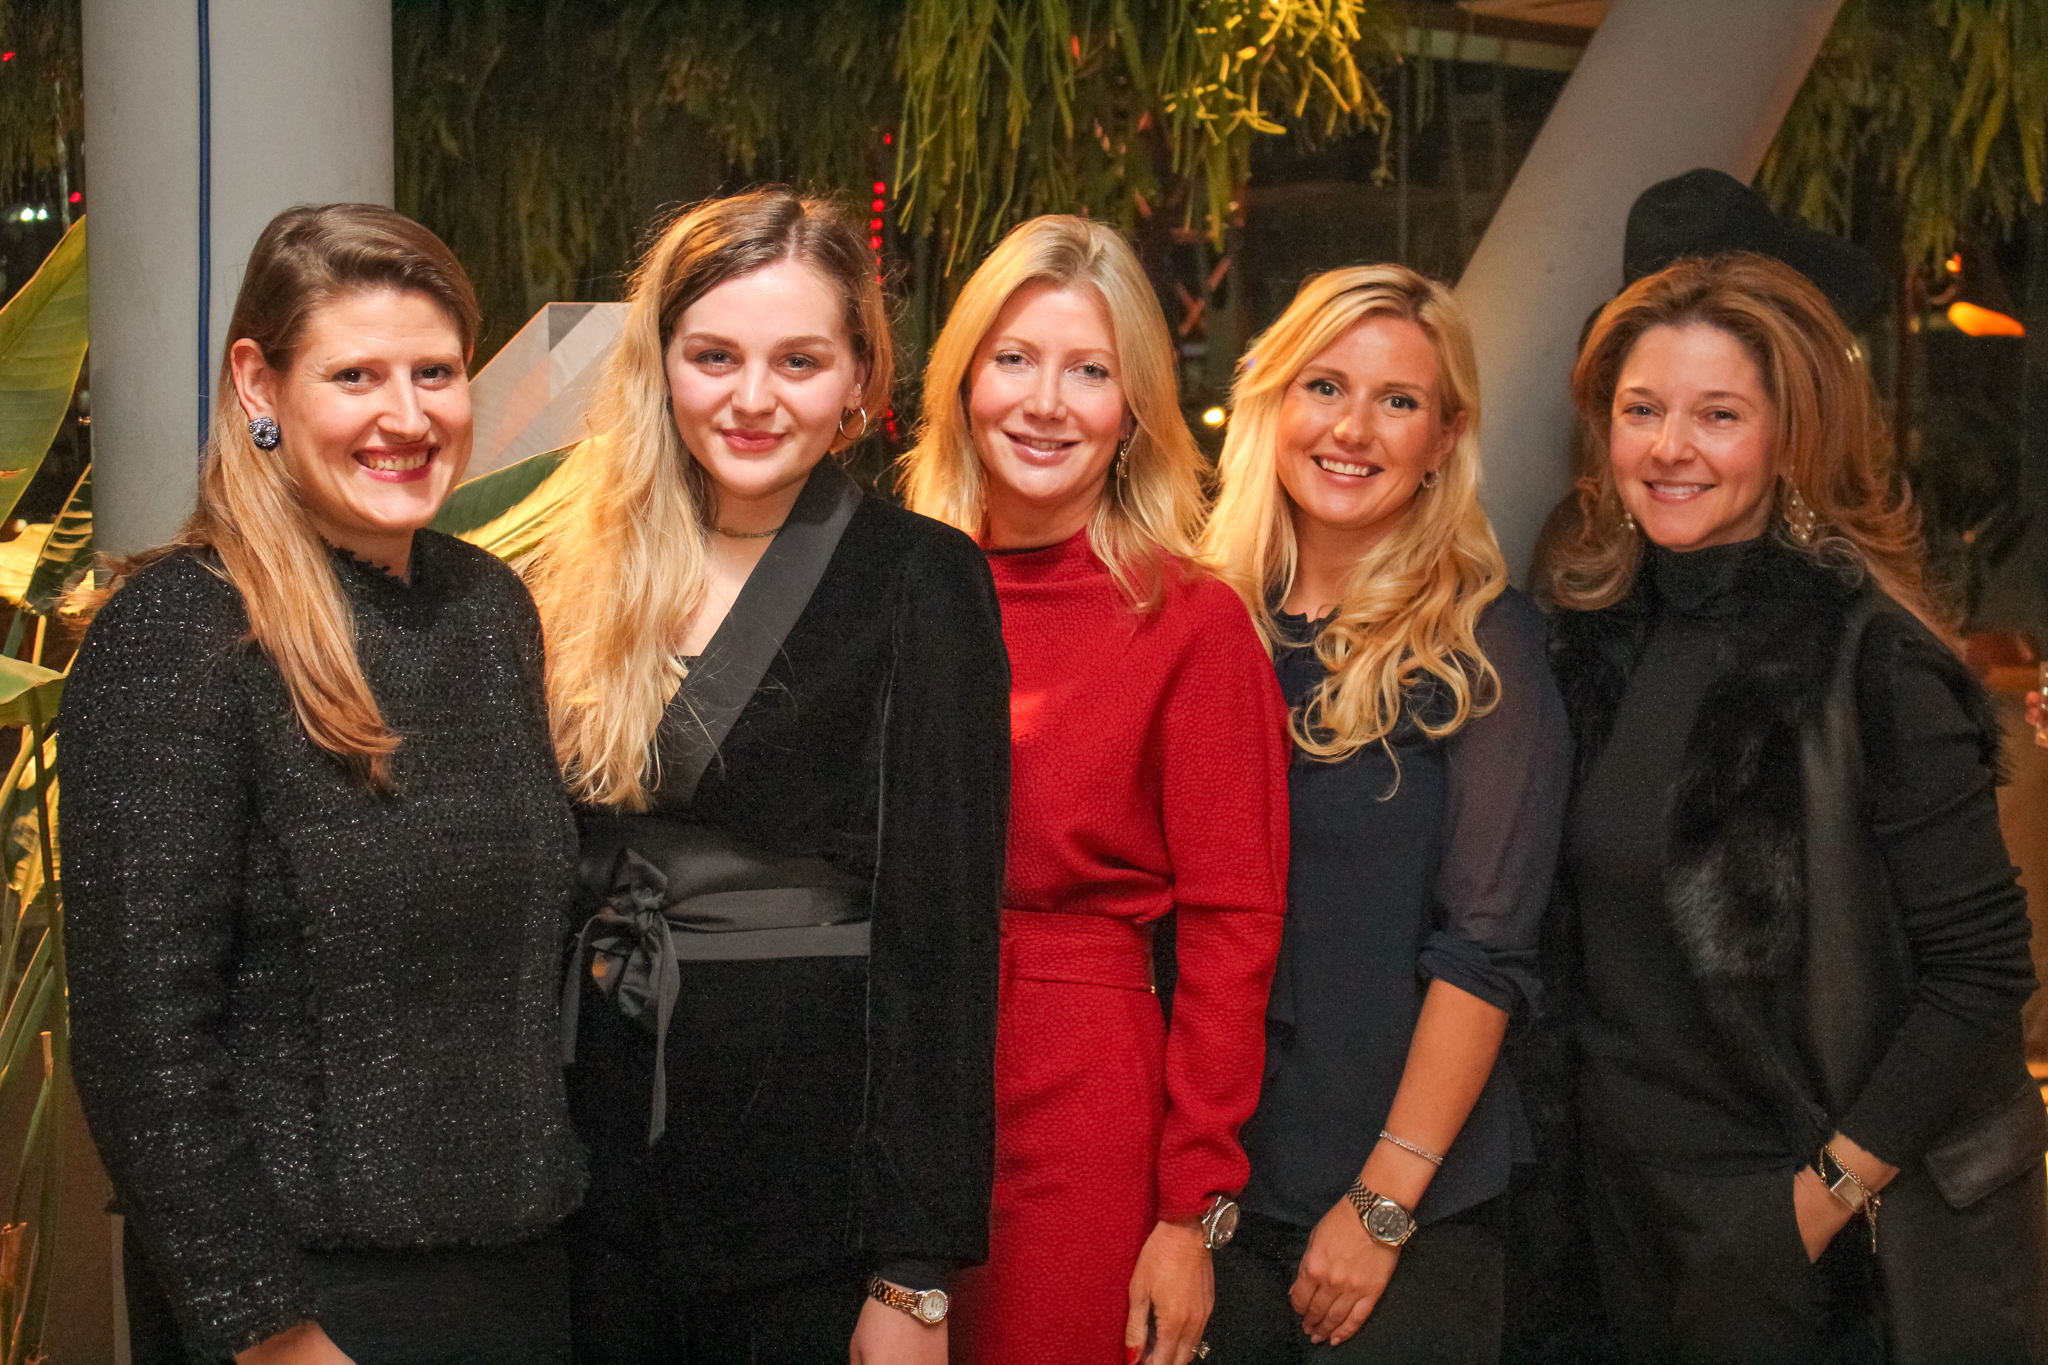 Theodora Clark, Hannah Clynch, Sigrid Kirk, Katrina Aleksa and Kate Gordon